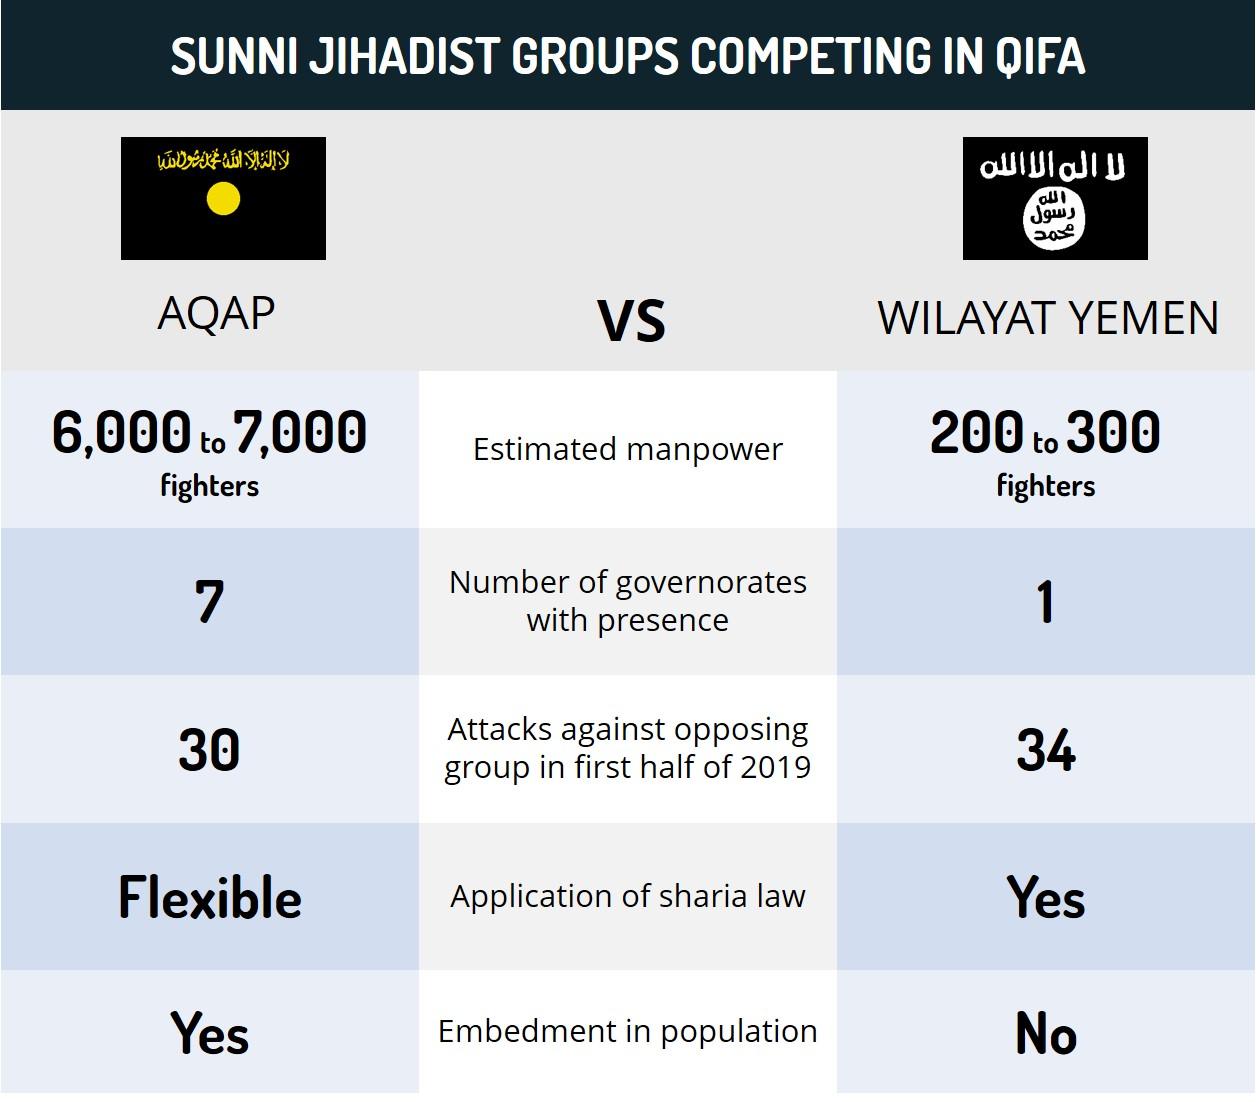 Sunni Jihadist Groups Competing in Qifa